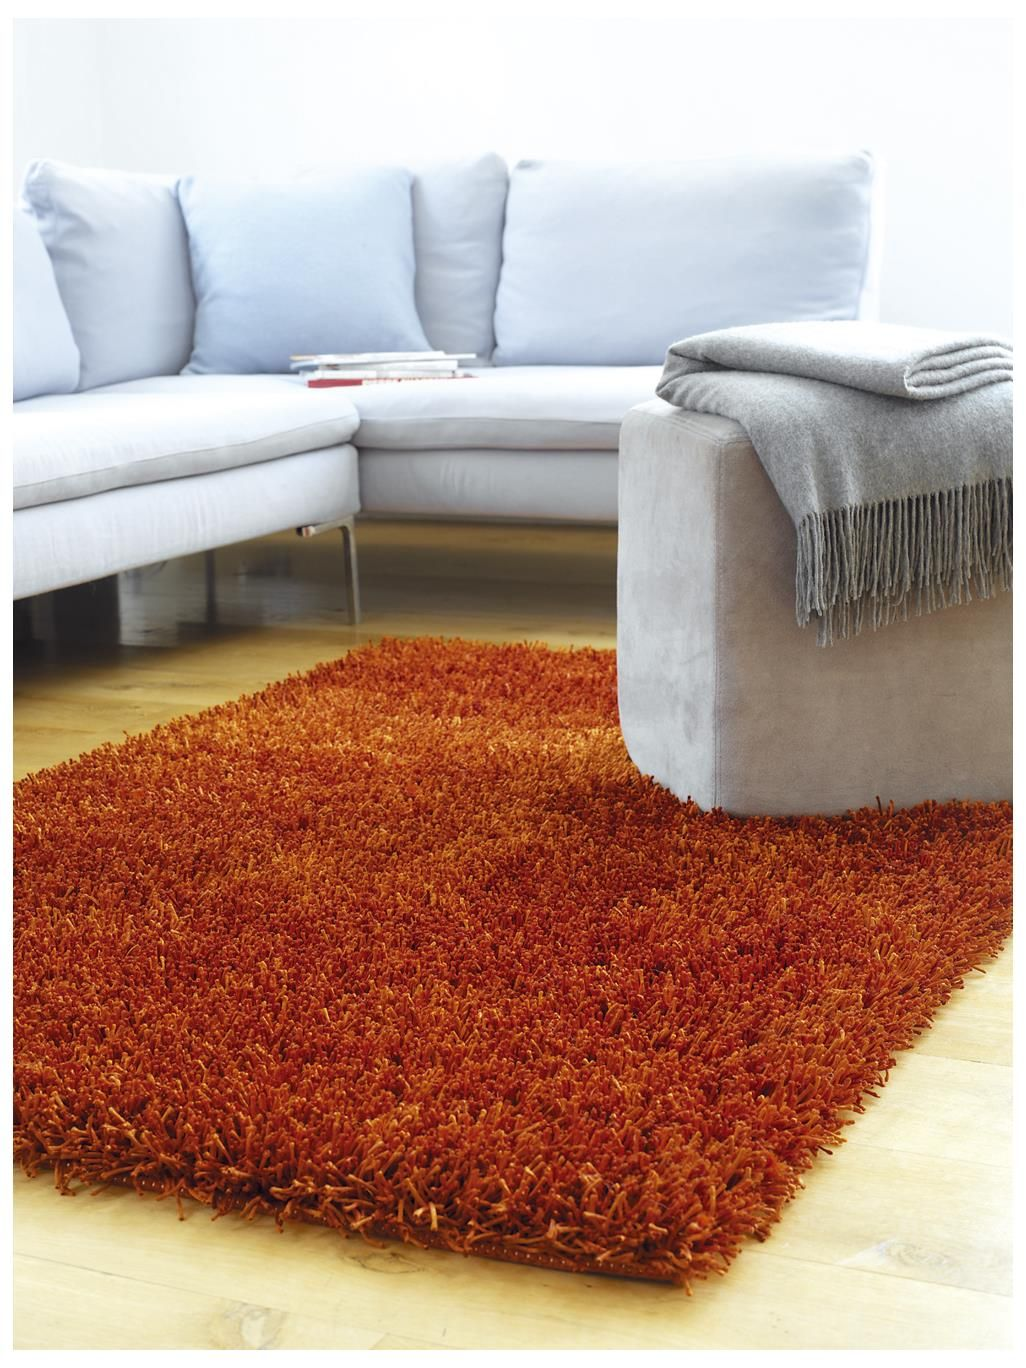 teppich preise amazing sarough teppich sarough farahan perser teppich x abbildung sarough. Black Bedroom Furniture Sets. Home Design Ideas